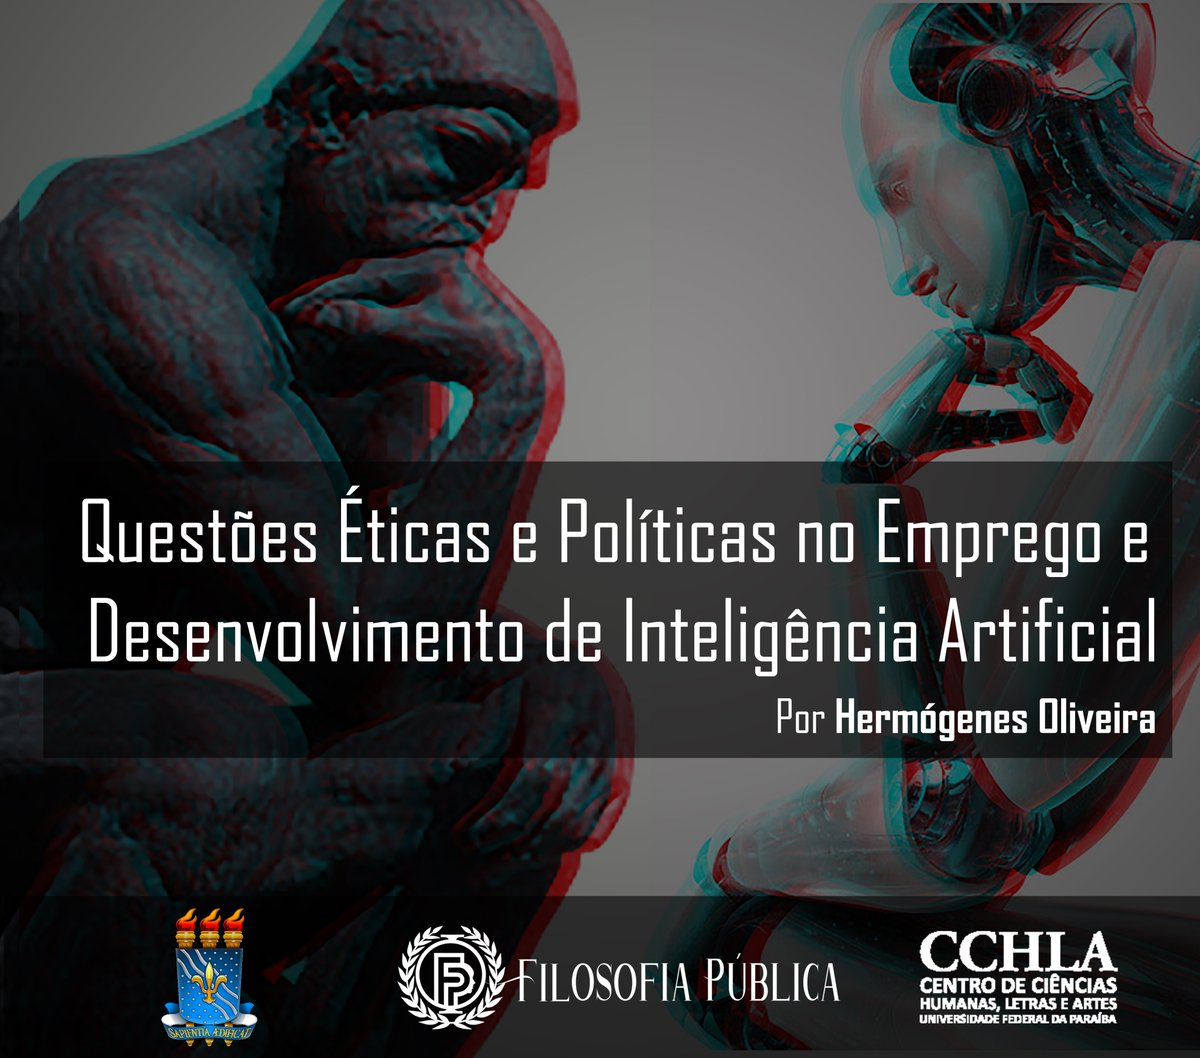 #InteligenciaArtificial #ArtificialIntelligence #Philosophy #ethics #policy #Filosofia #robo #Robotics https://t.co/vzMytcyRq4